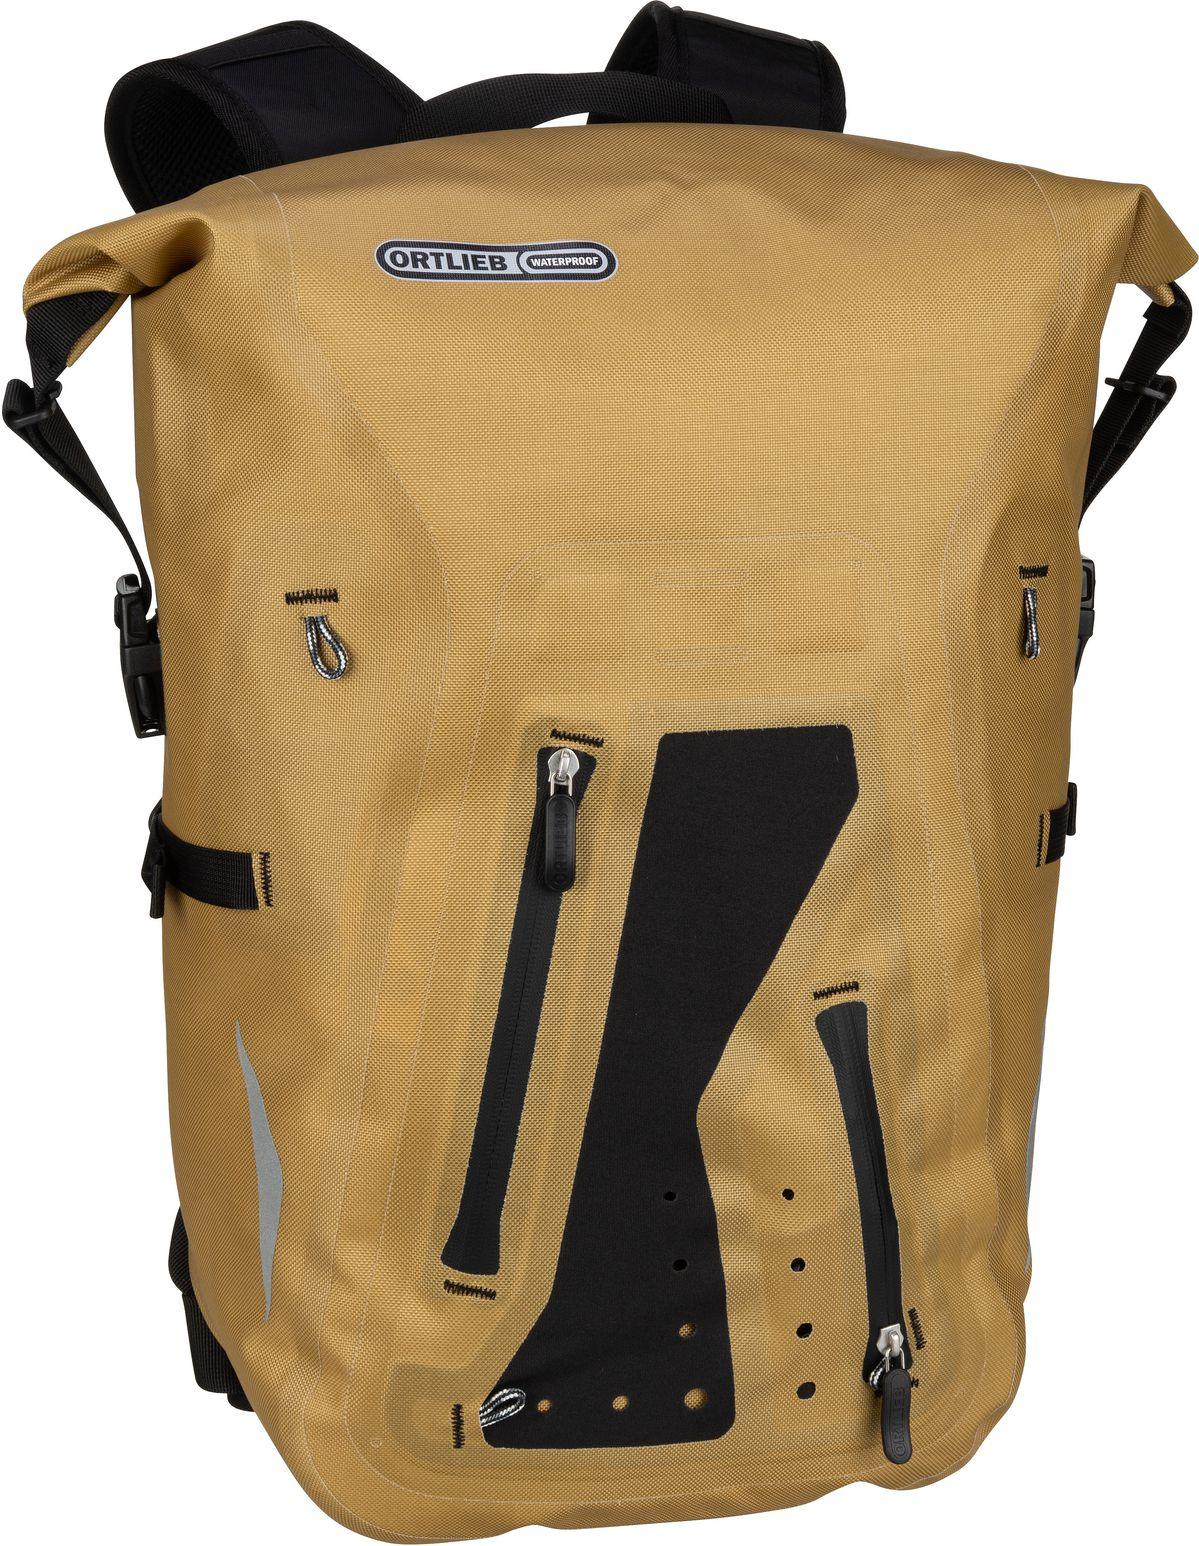 Rucksack / Daypack Packman Pro 2 Mustard (25 Liter)